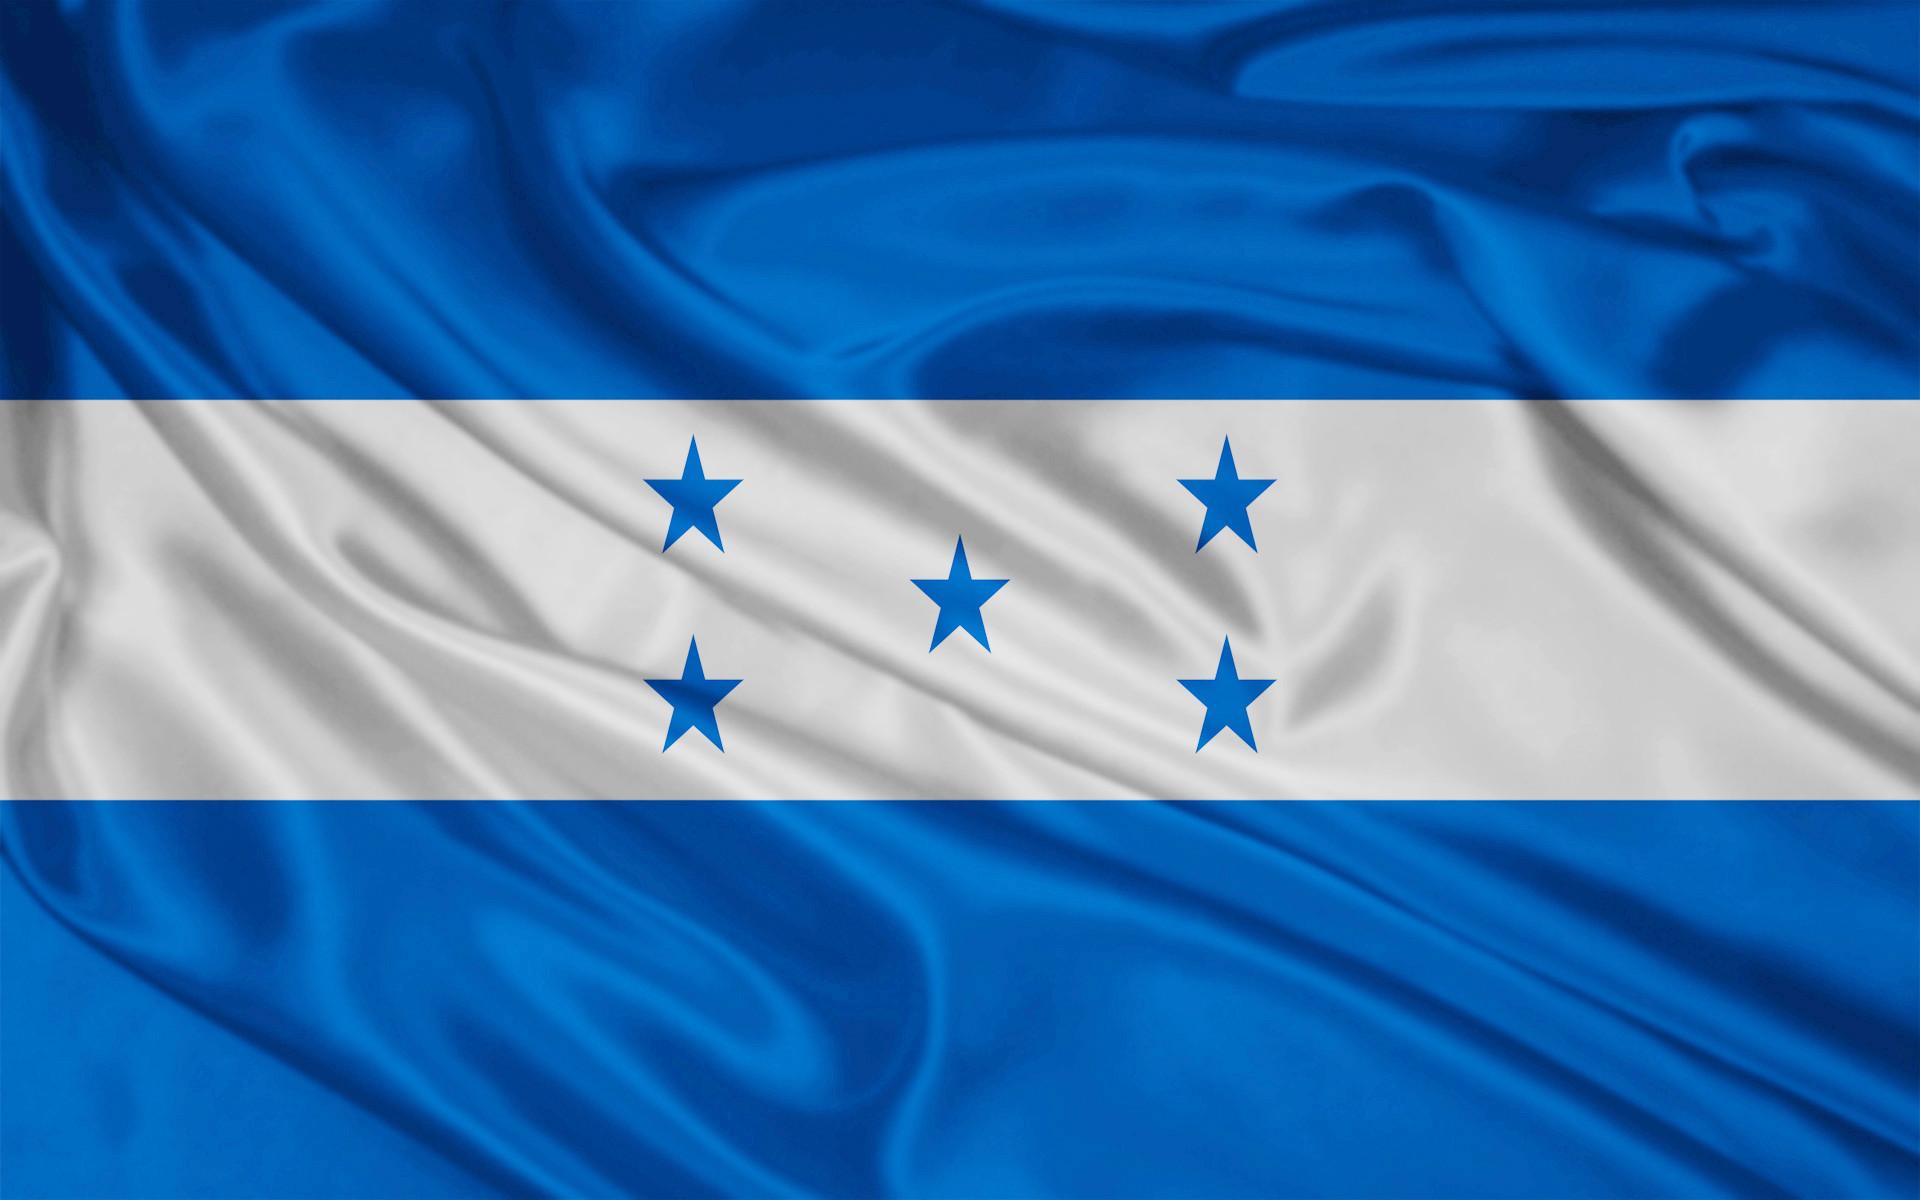 … Yosemite · Next: Honduras Flag. Category: World wallpapers